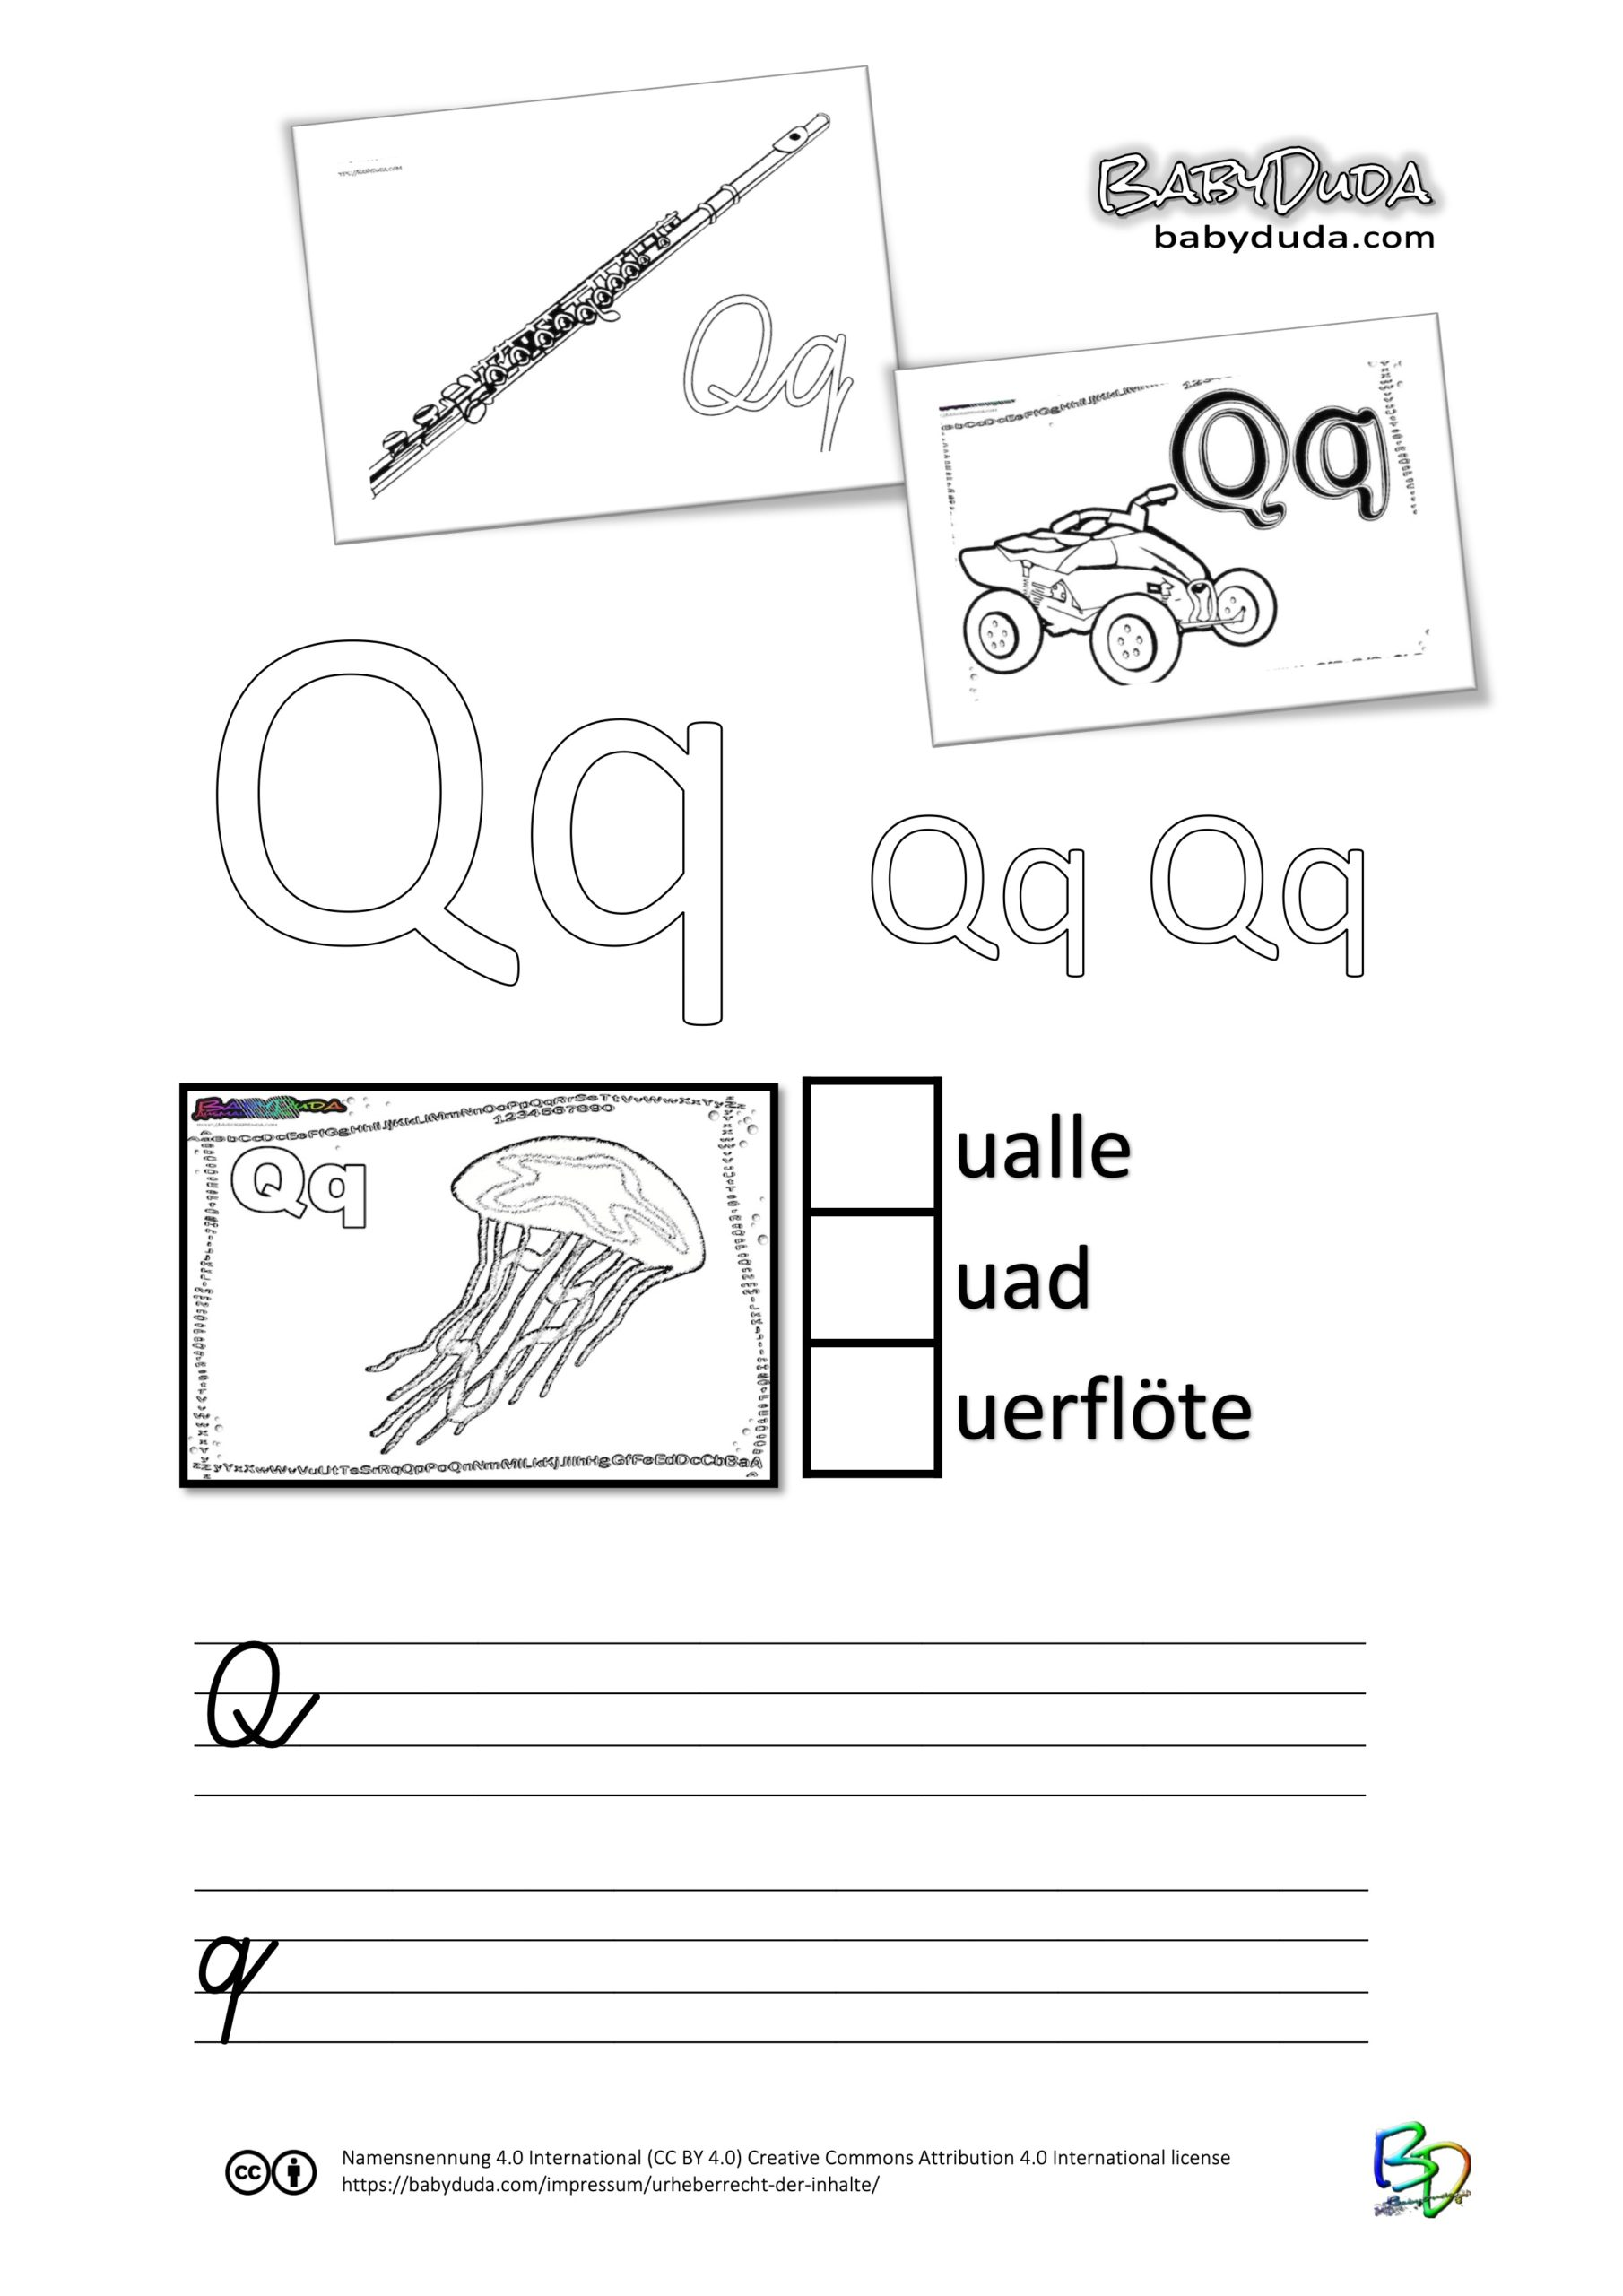 ABC-Ausmalbuch-Arbeitsblatt-Q